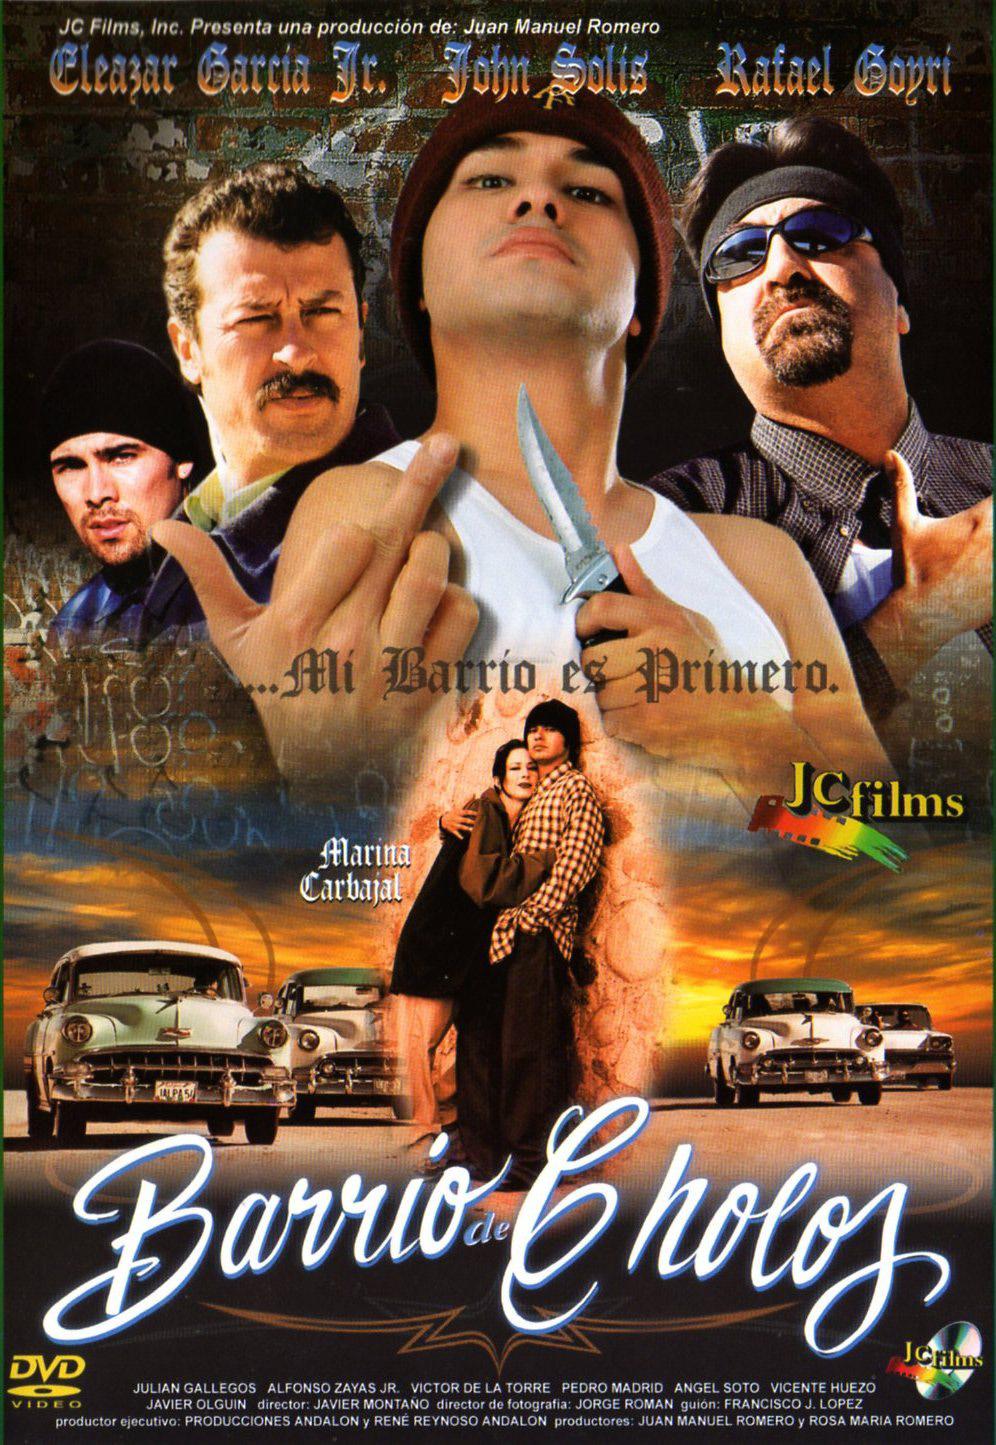 cb19f4ef818 Barrio de cholos (Video 2001) - IMDb